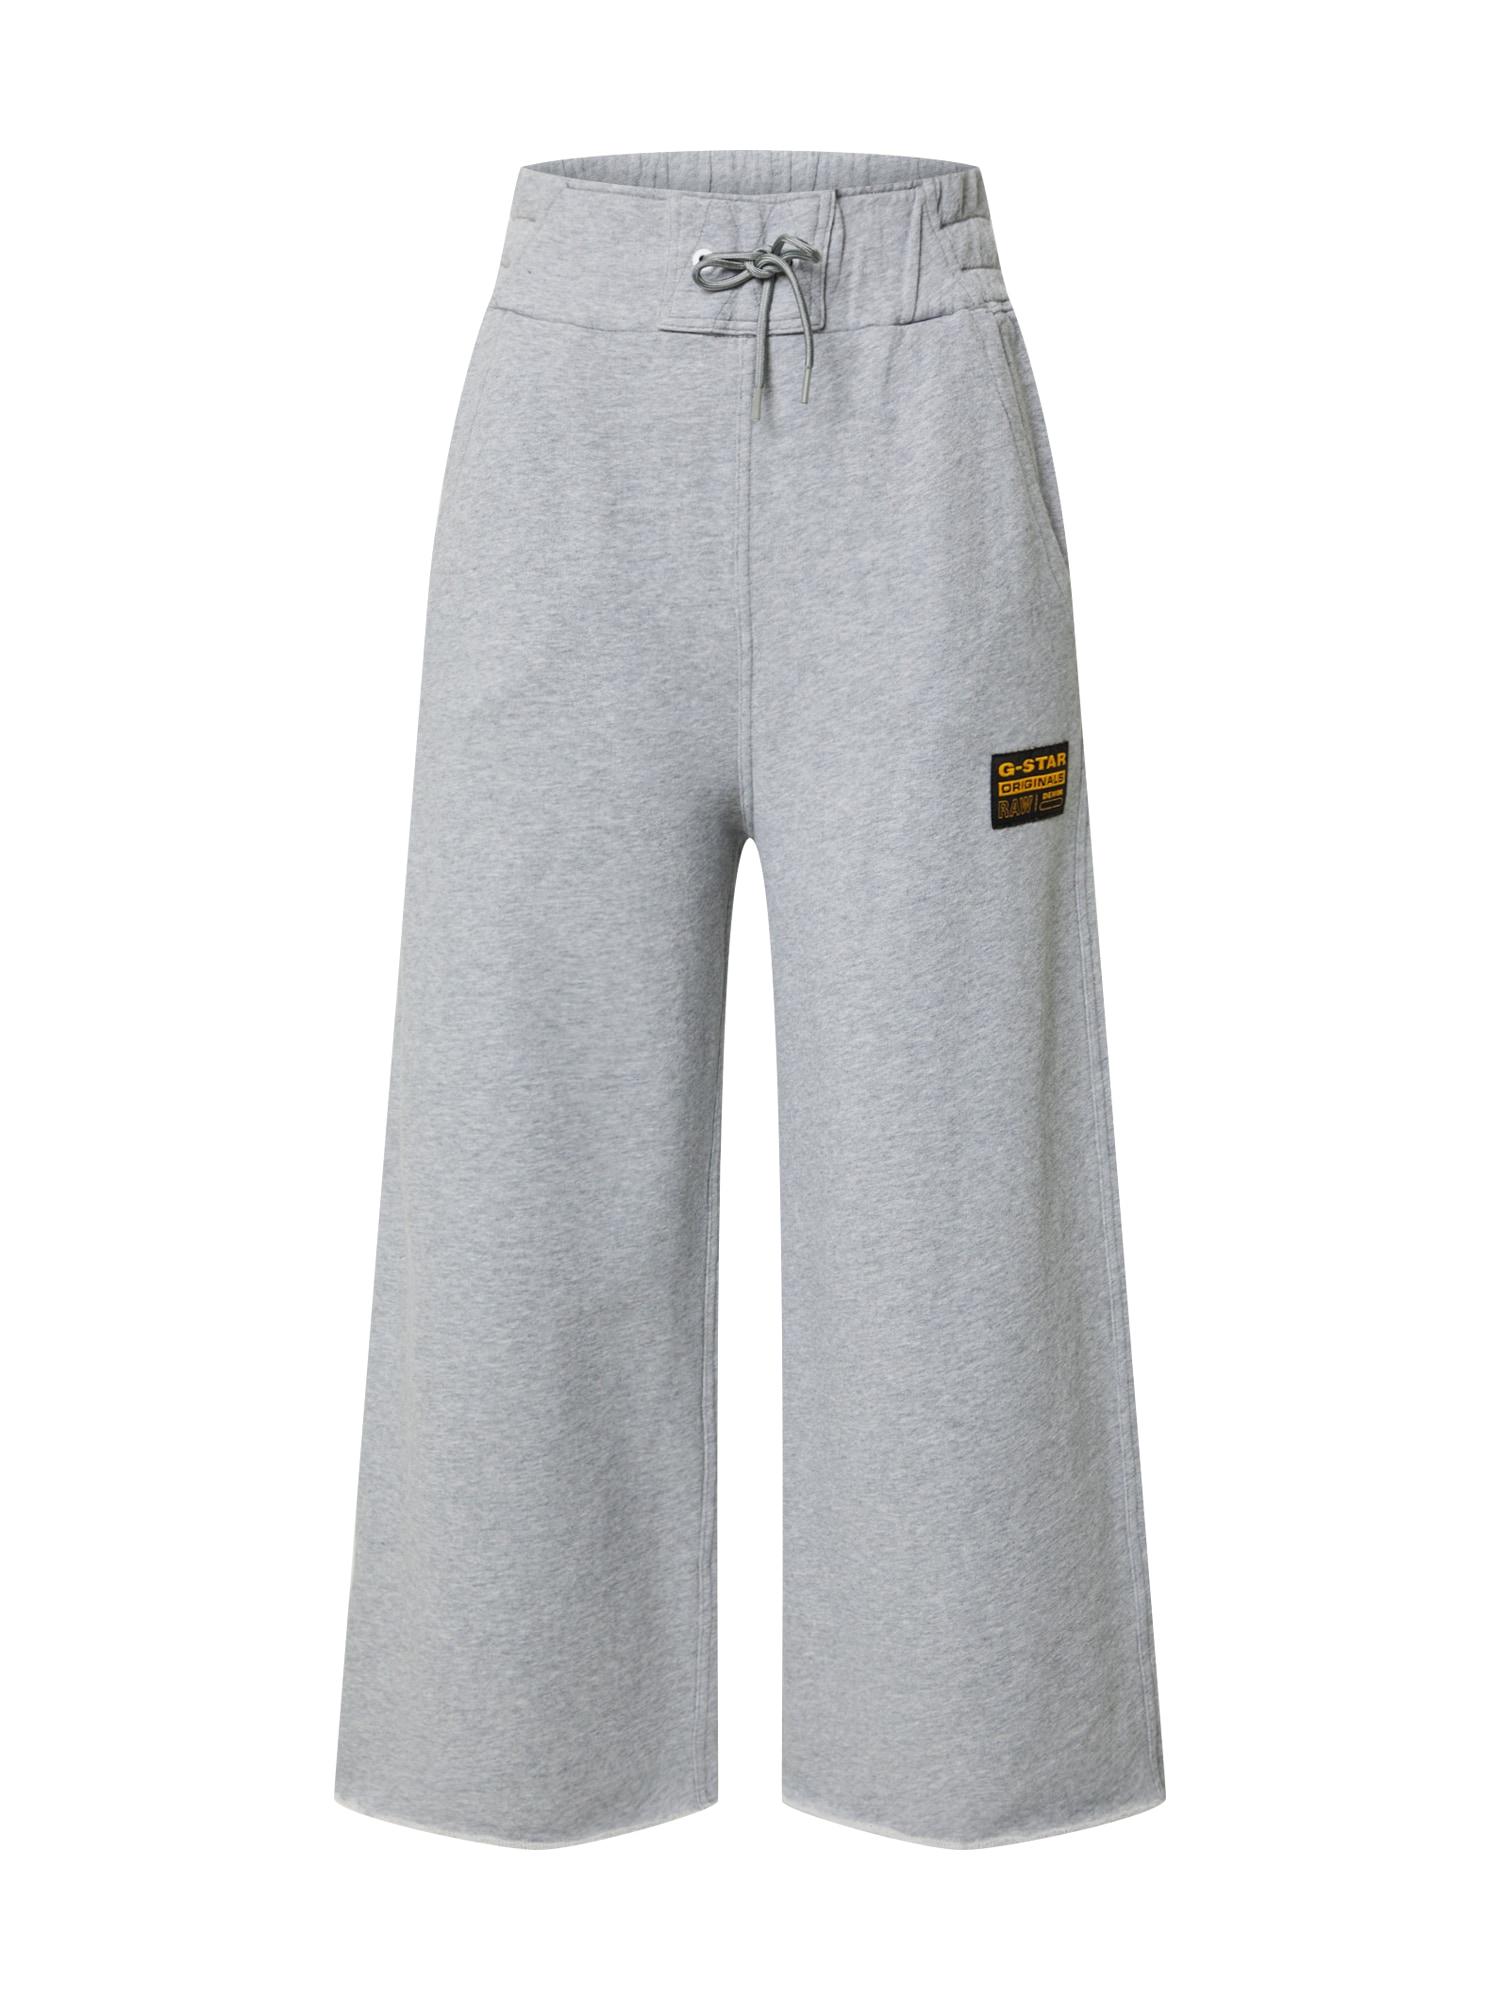 G-Star RAW Kelnės 'Culotte' margai pilka